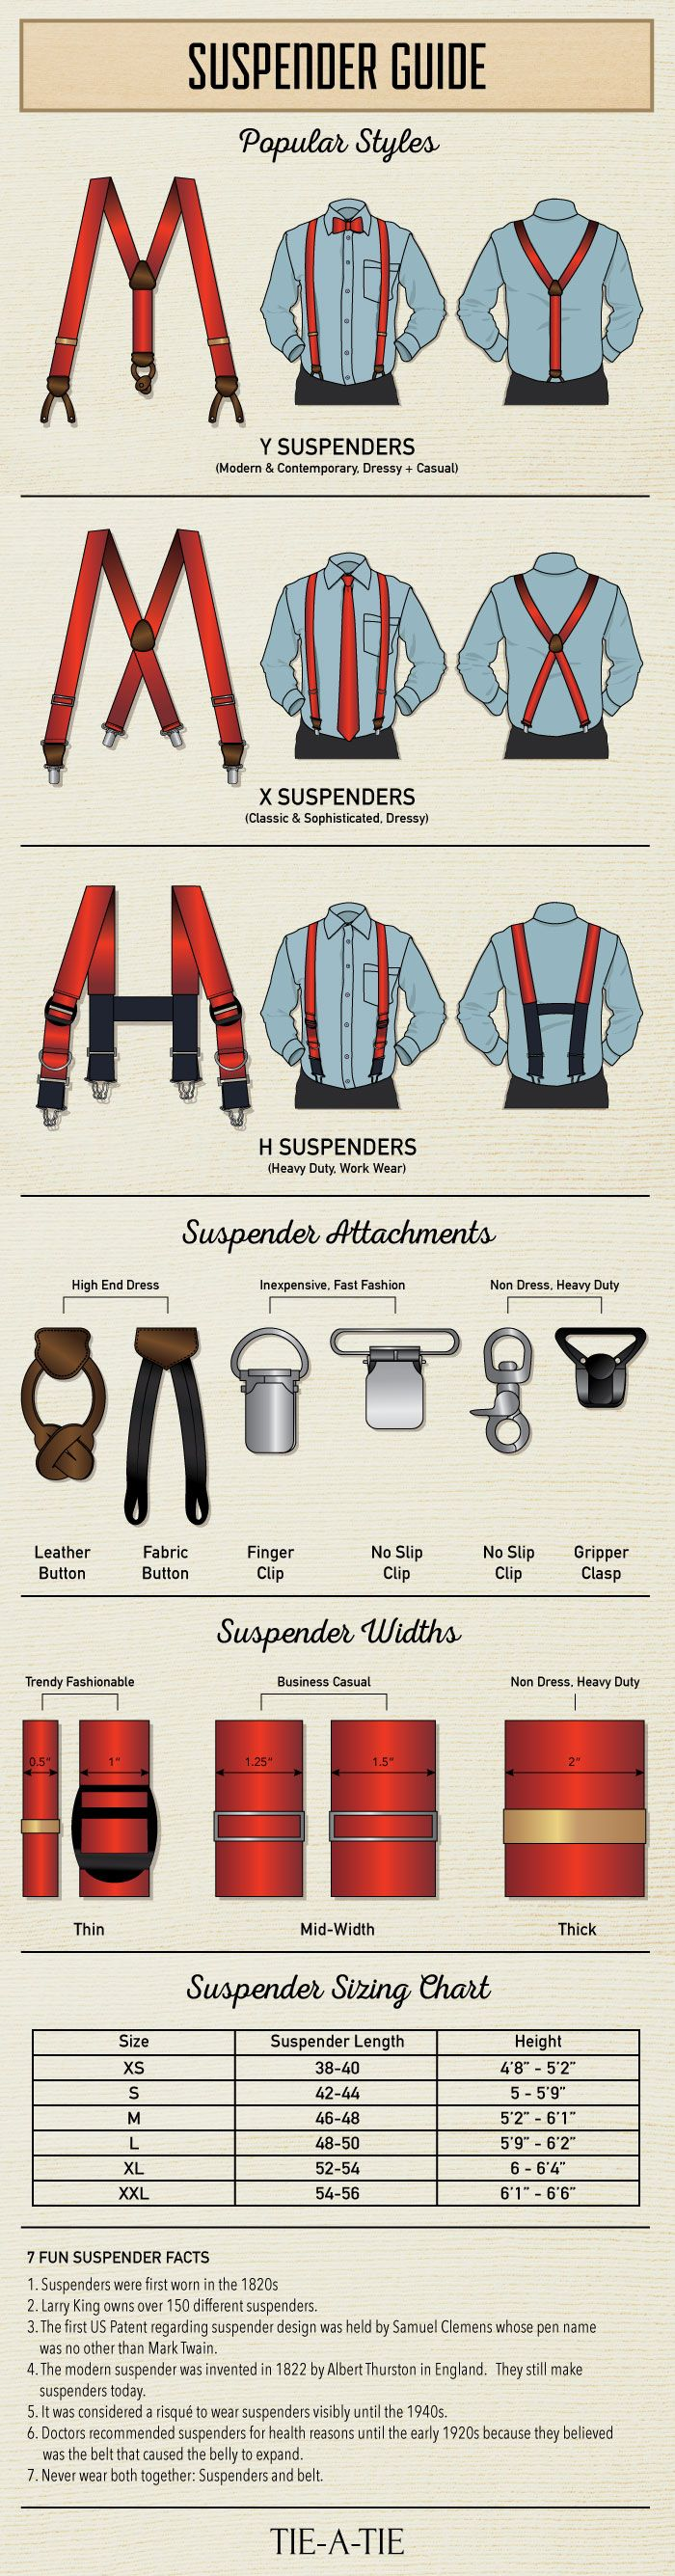 Suspenders 101: A Complete Guide to Men's Suspenders